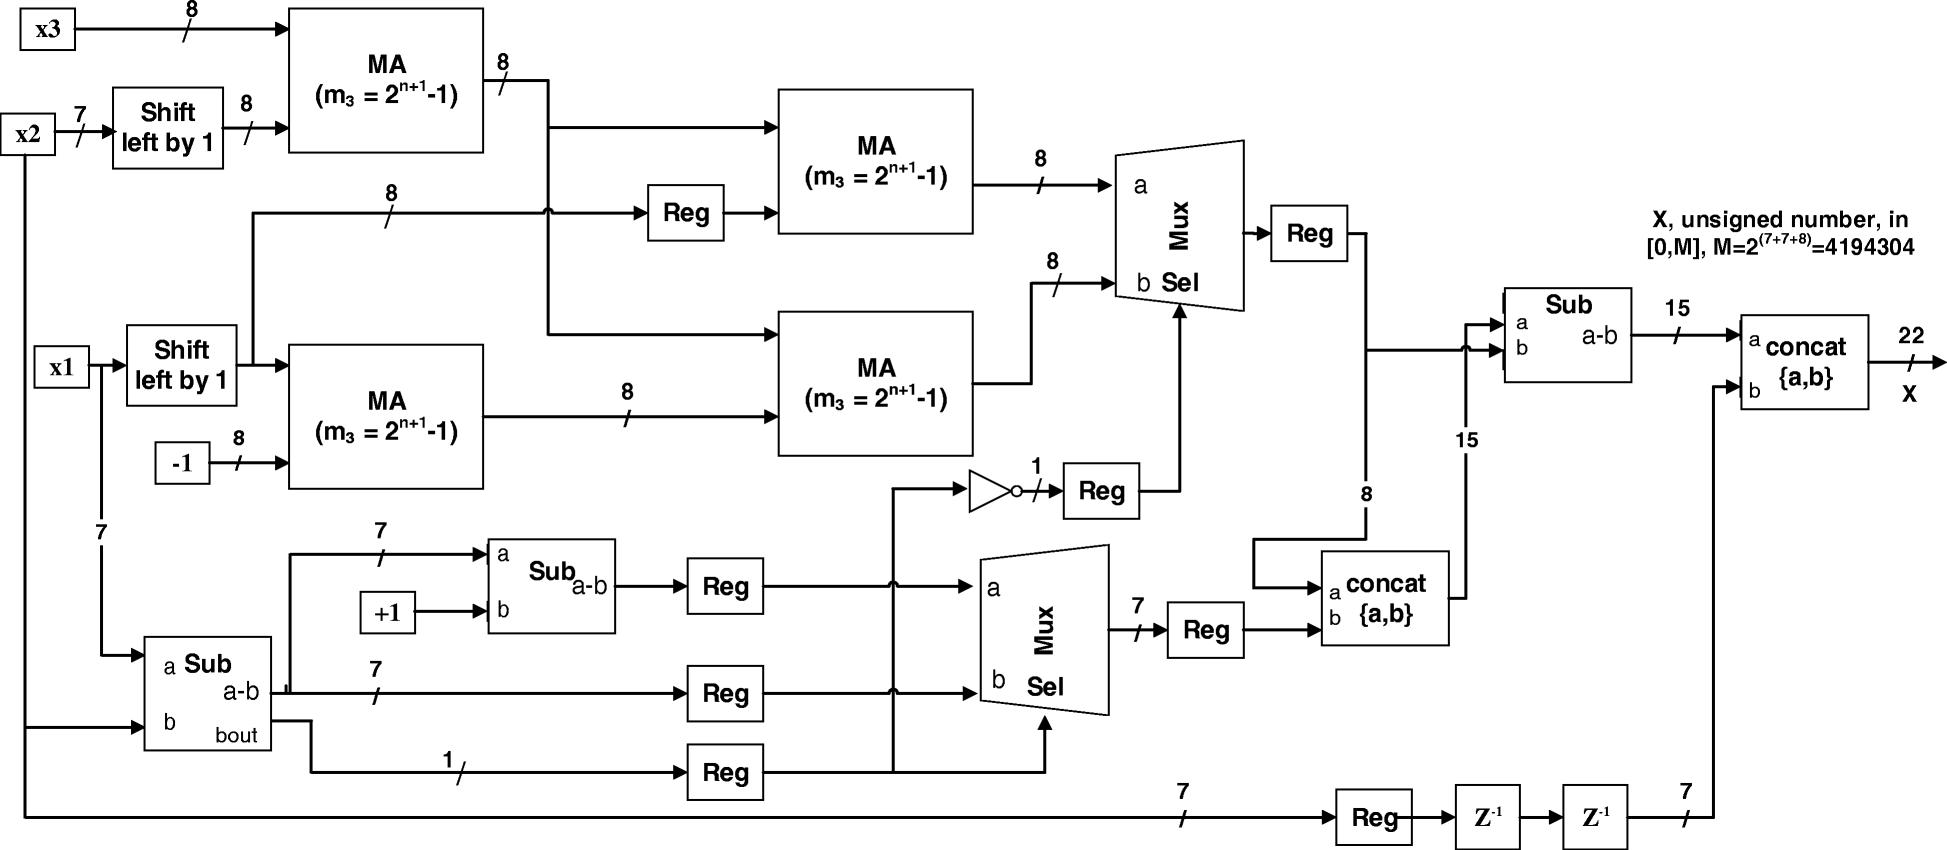 An Optimized Two Level Discrete Wavelet Implementation Using Residue Logic Analyzer Block Diagram Fig 6 The